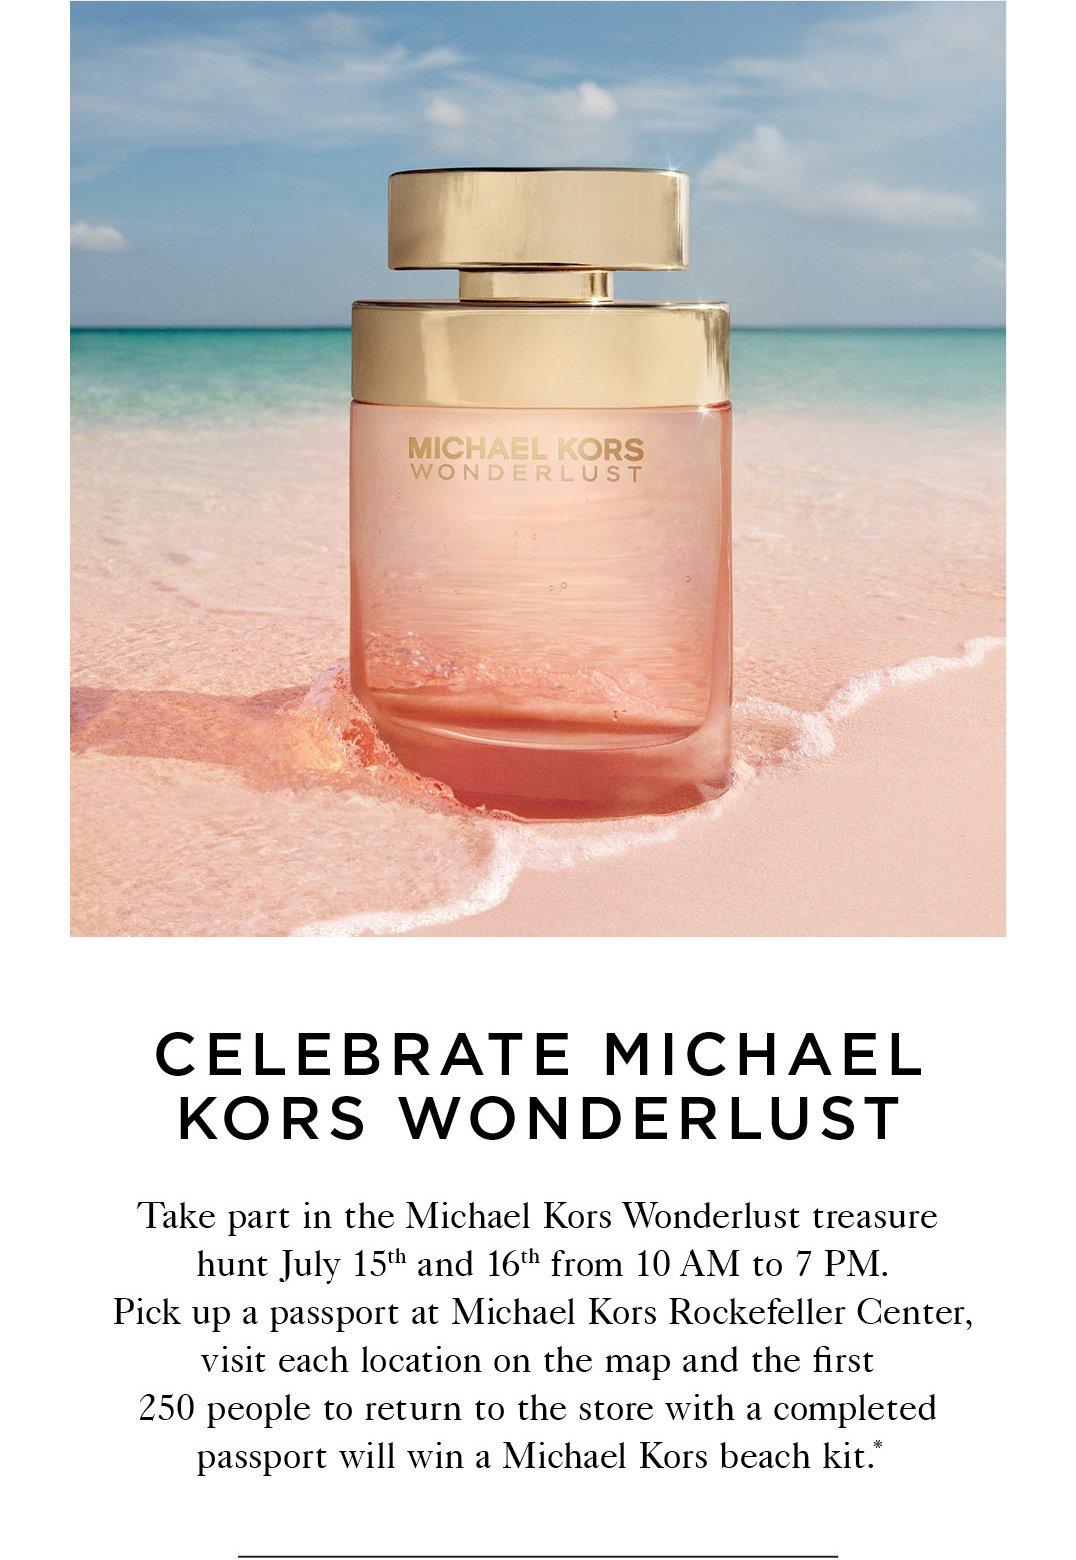 Michael Kors You Re Invited Celebrate Michael Kors